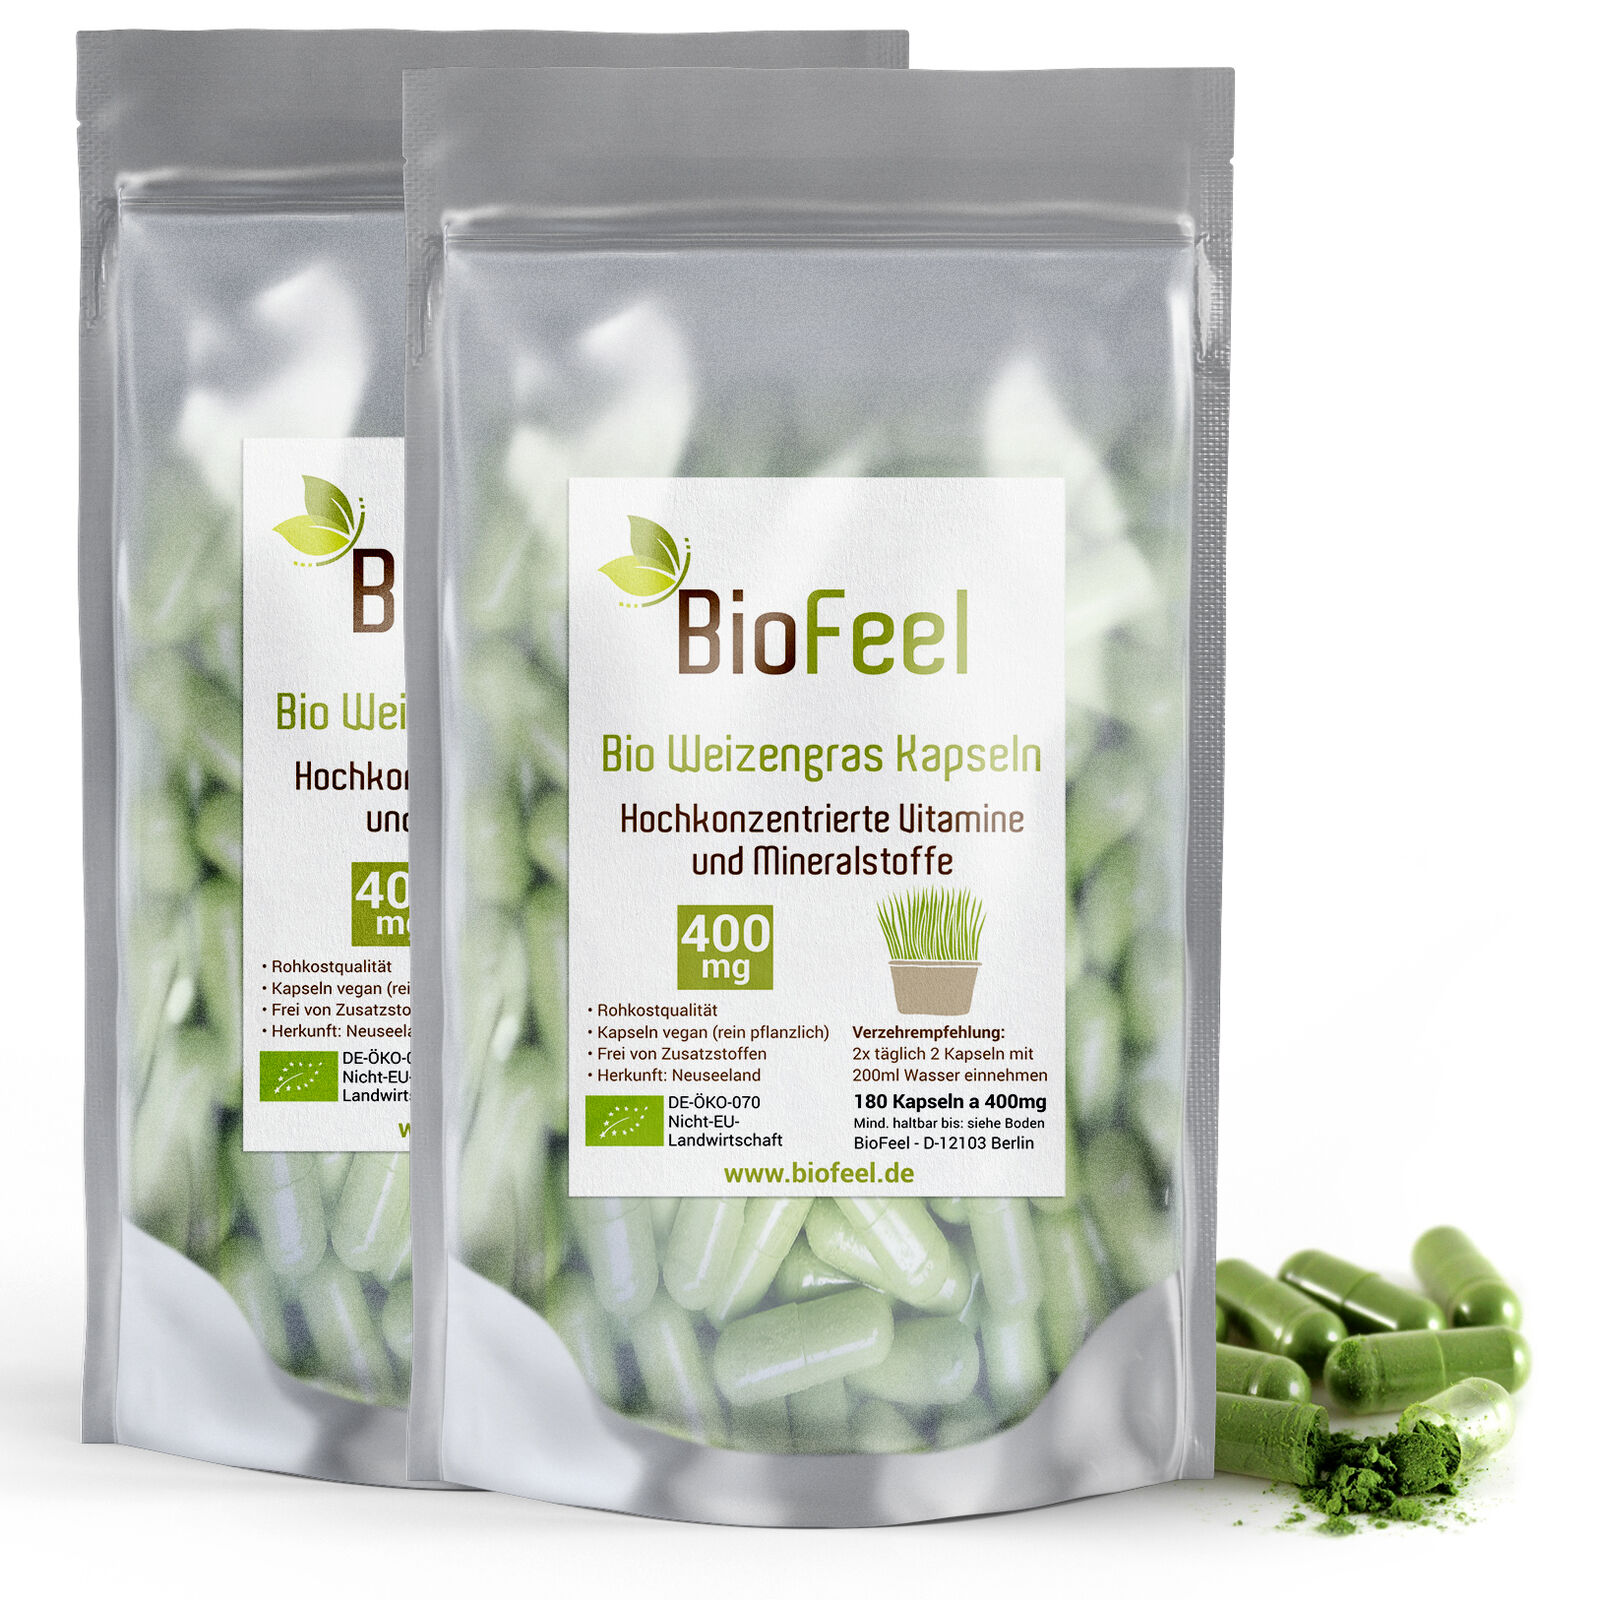 BioFeel - Bio Weizengras Kapseln, 360 Stk., 400mg (2x 180 Stk.)